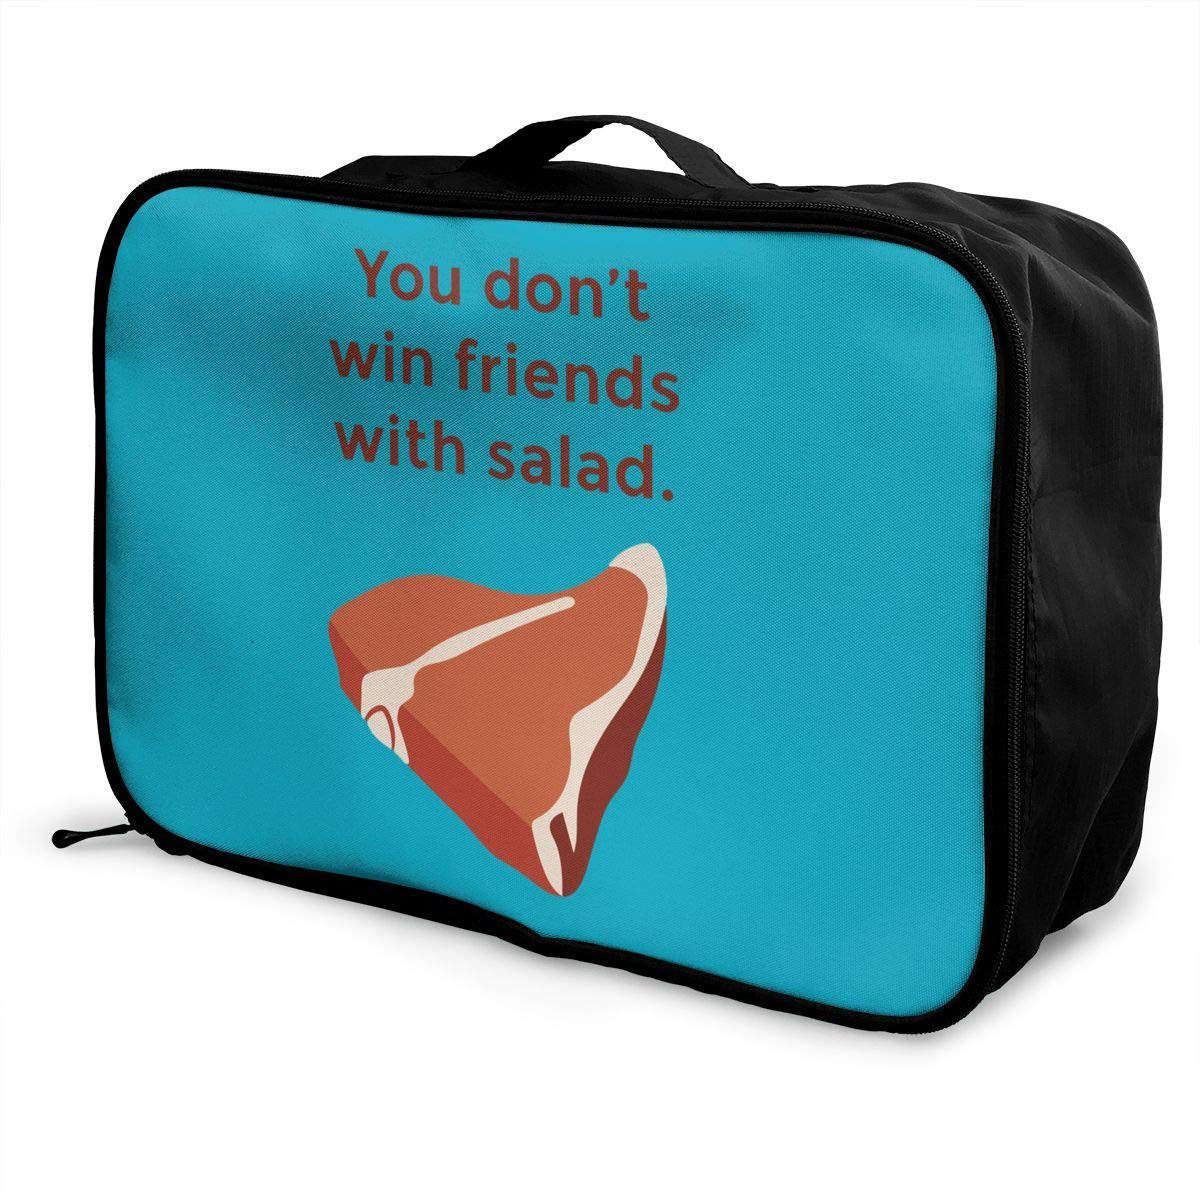 Travel Luggage Duffle Bag Lightweight Portable Handbag Salad Large Capacity Waterproof Foldable Storage Tote